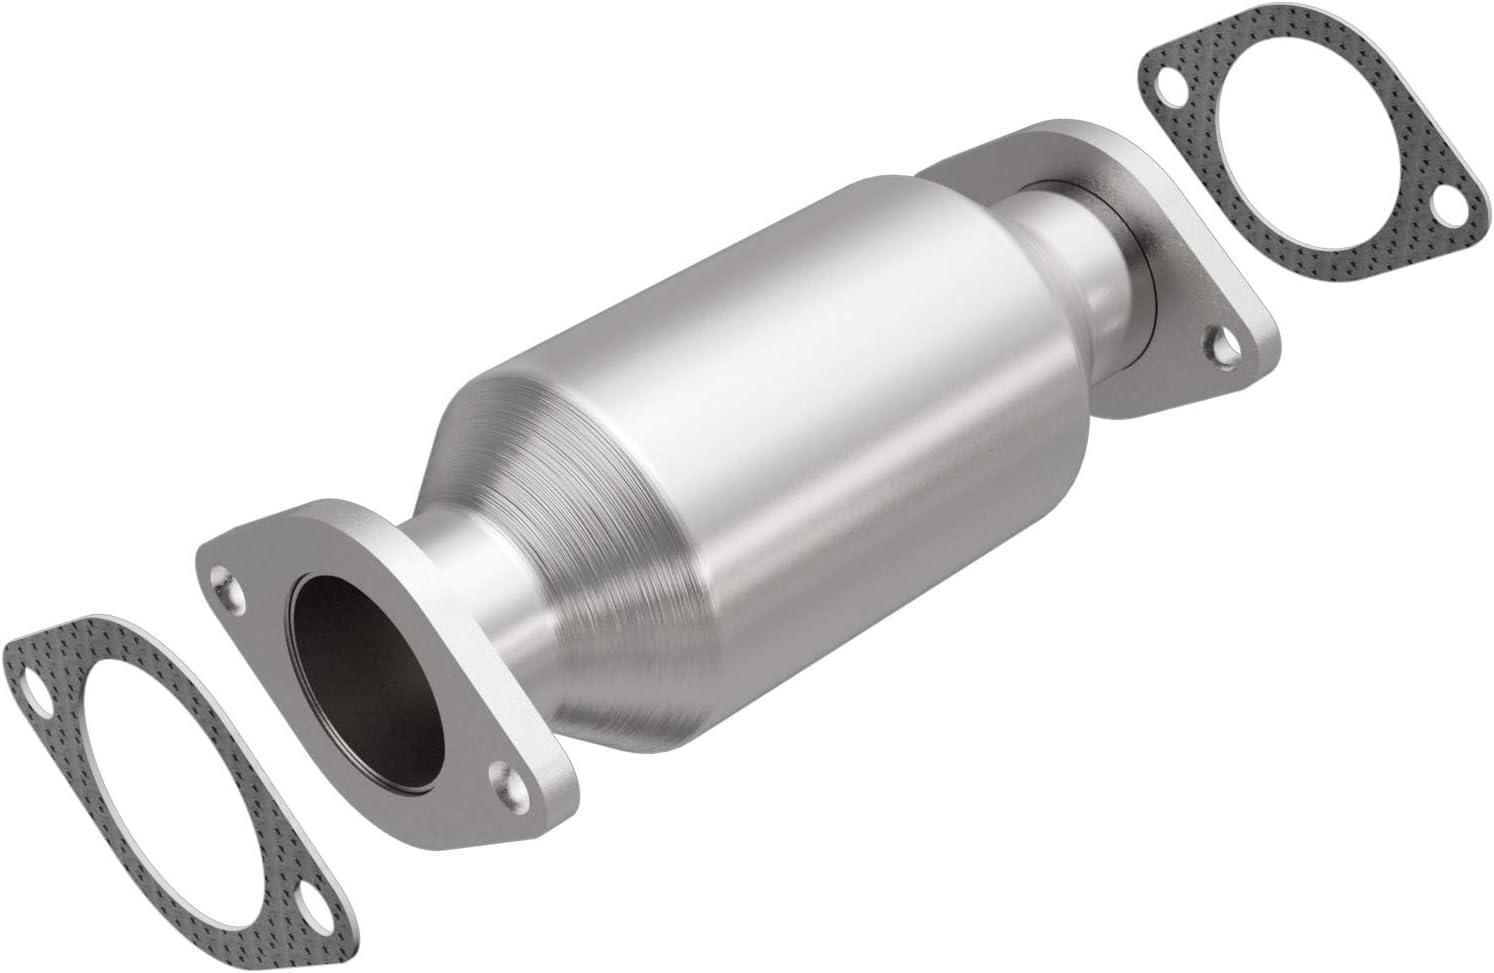 Non CARB compliant Magnaflow 23453 Direct Fit Catalytic Converter